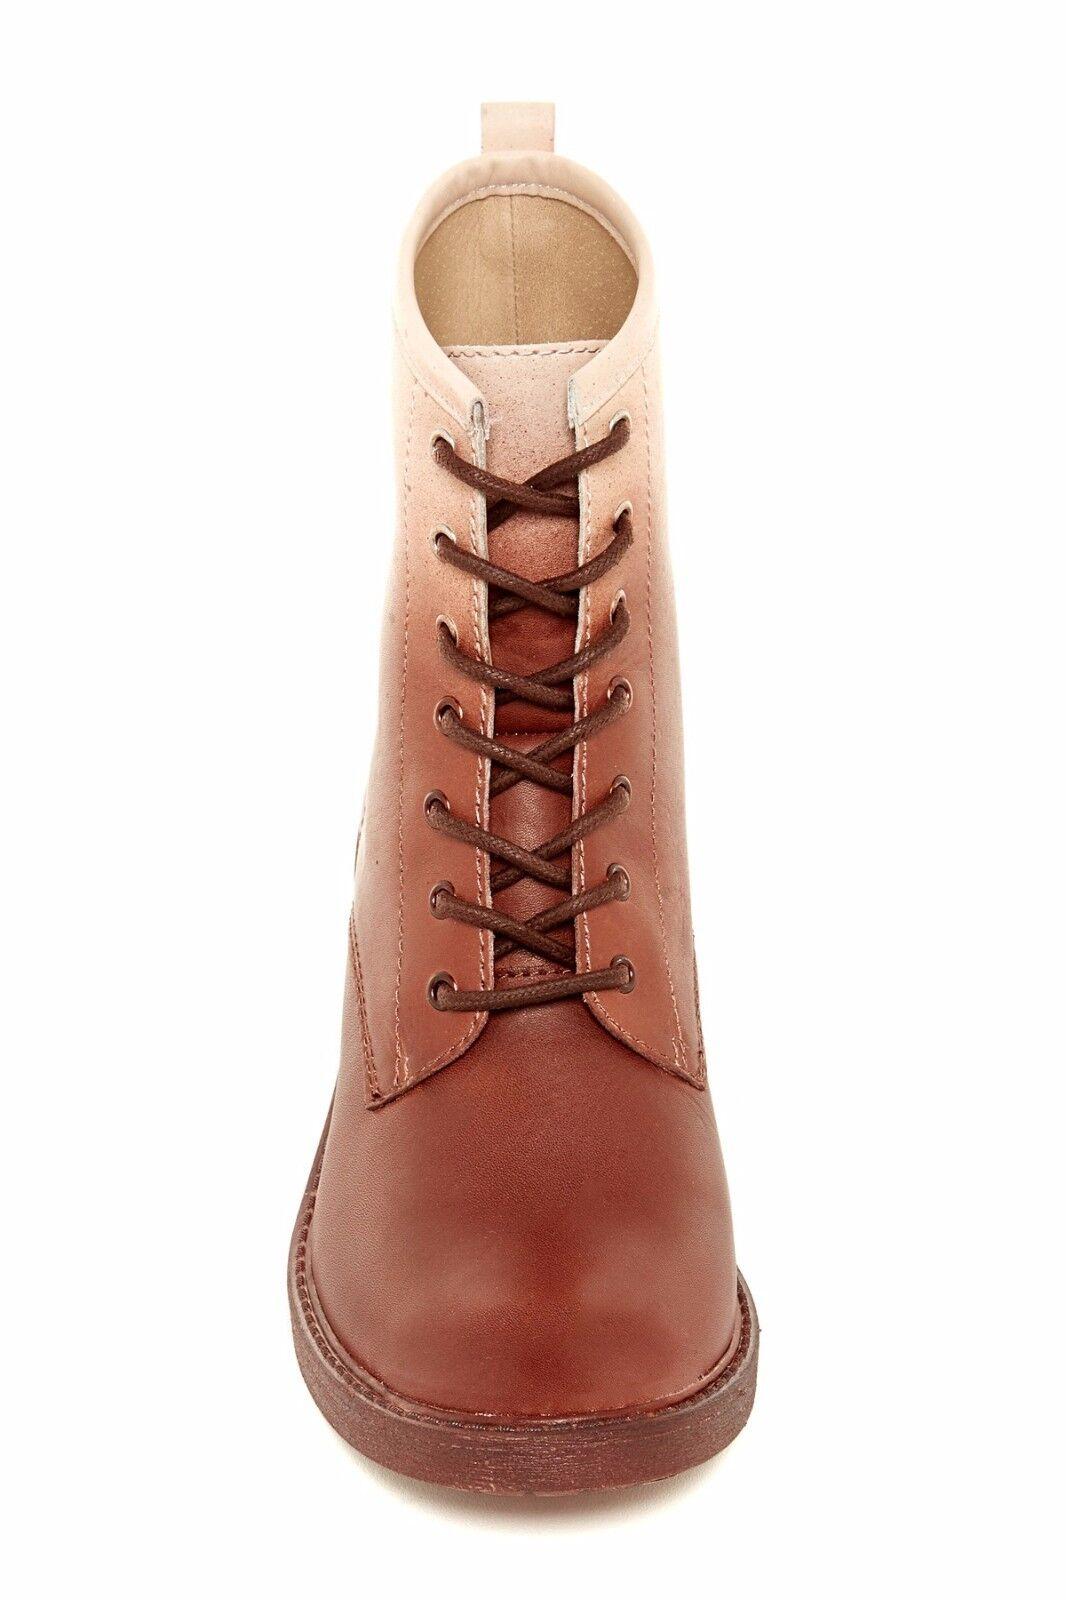 New Lucky Brand Novembere Lace-Up Leder Leder Lace-Up  Stiefel Damens's sz 6 e4f4c4